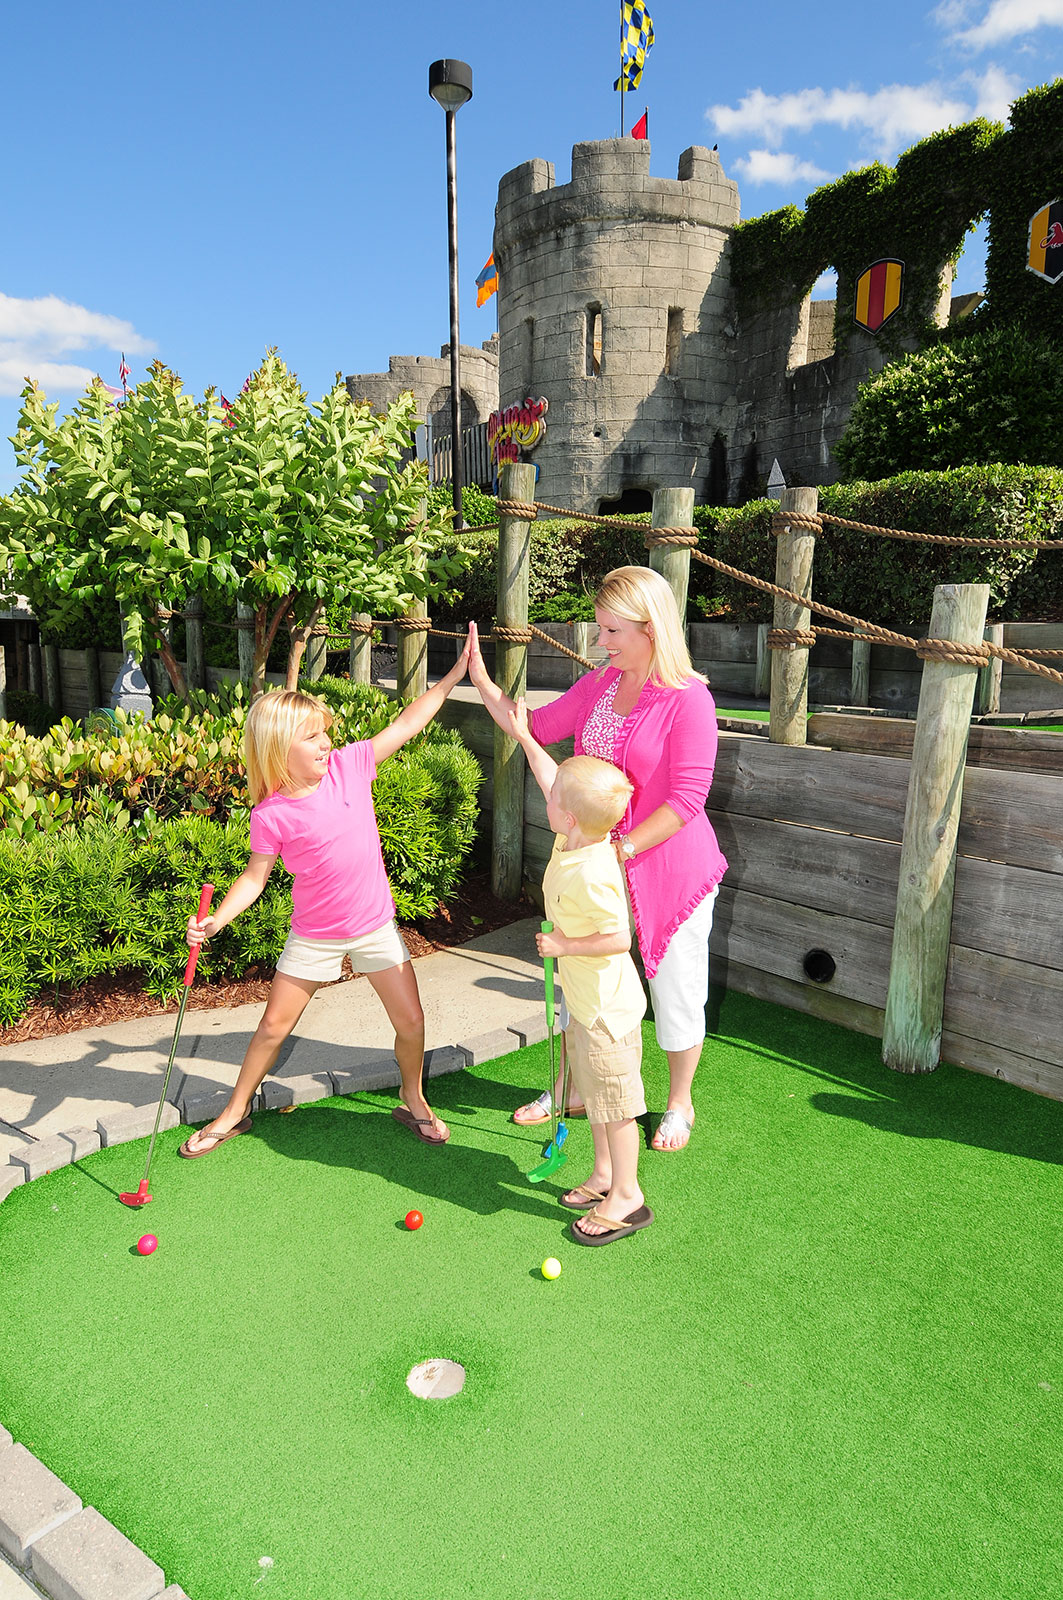 Dragon S Lair Myrtle Beach Family Golf Myrtle Beach Sc